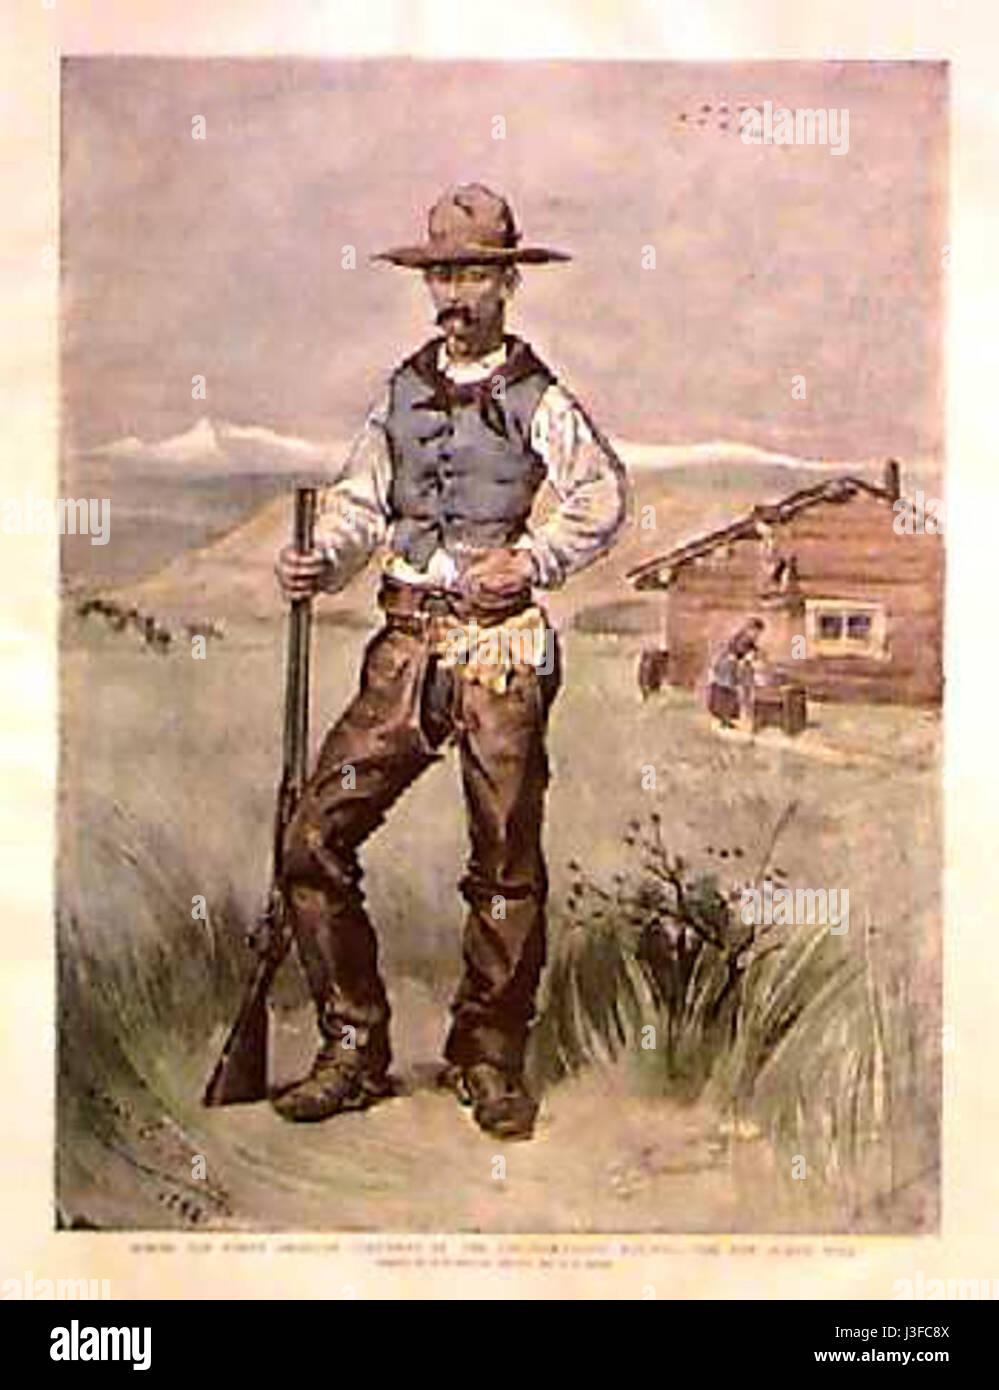 Fripp cowboy Photo Stock